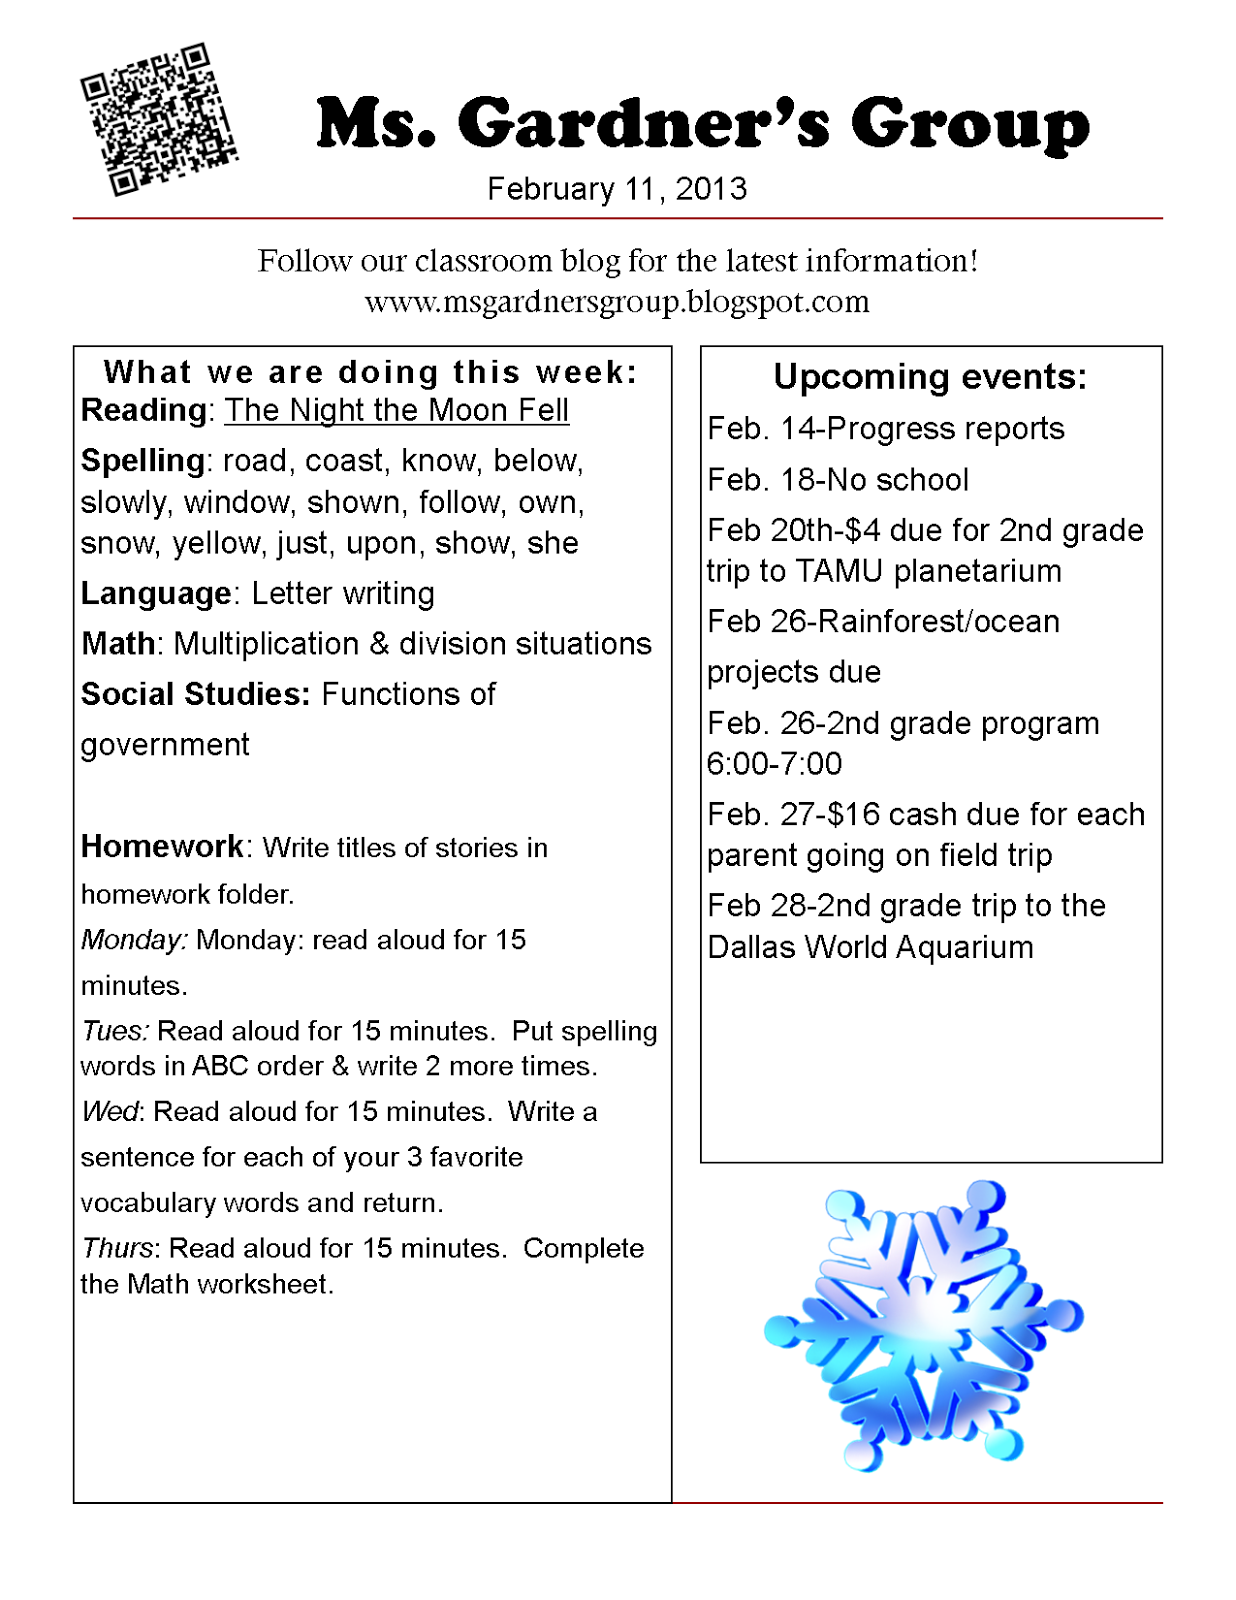 medium resolution of Ms. Gardner's Group: February 2013